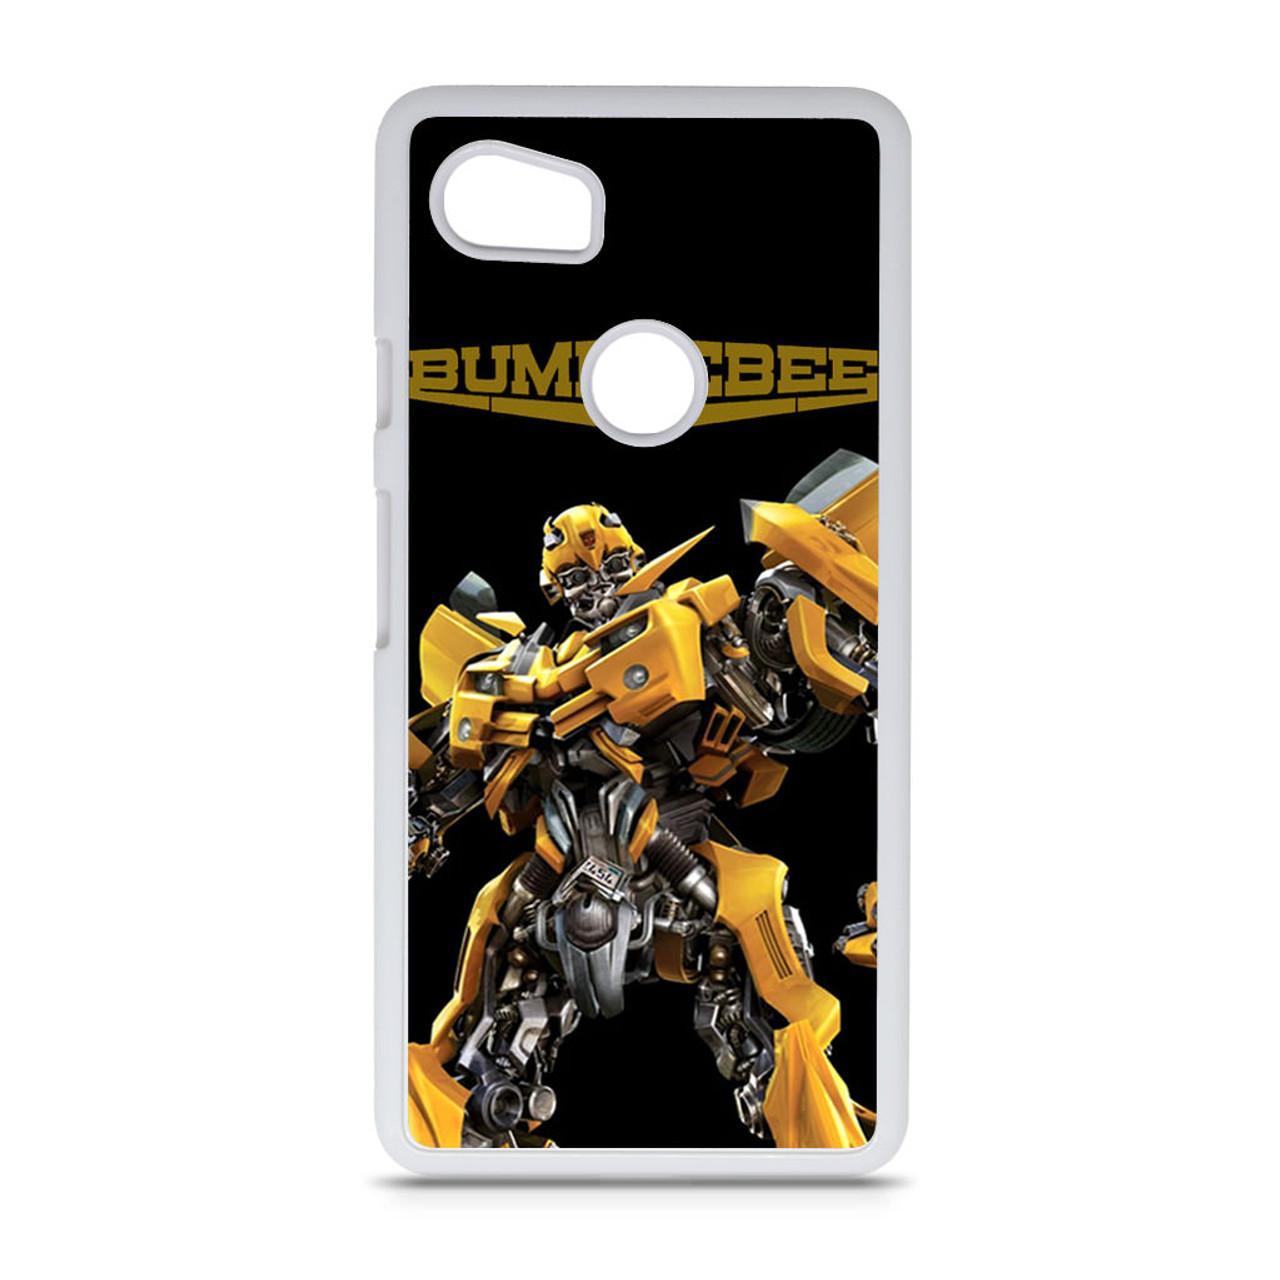 Transformers Bumblebee Google Pixel 2 Xl Case